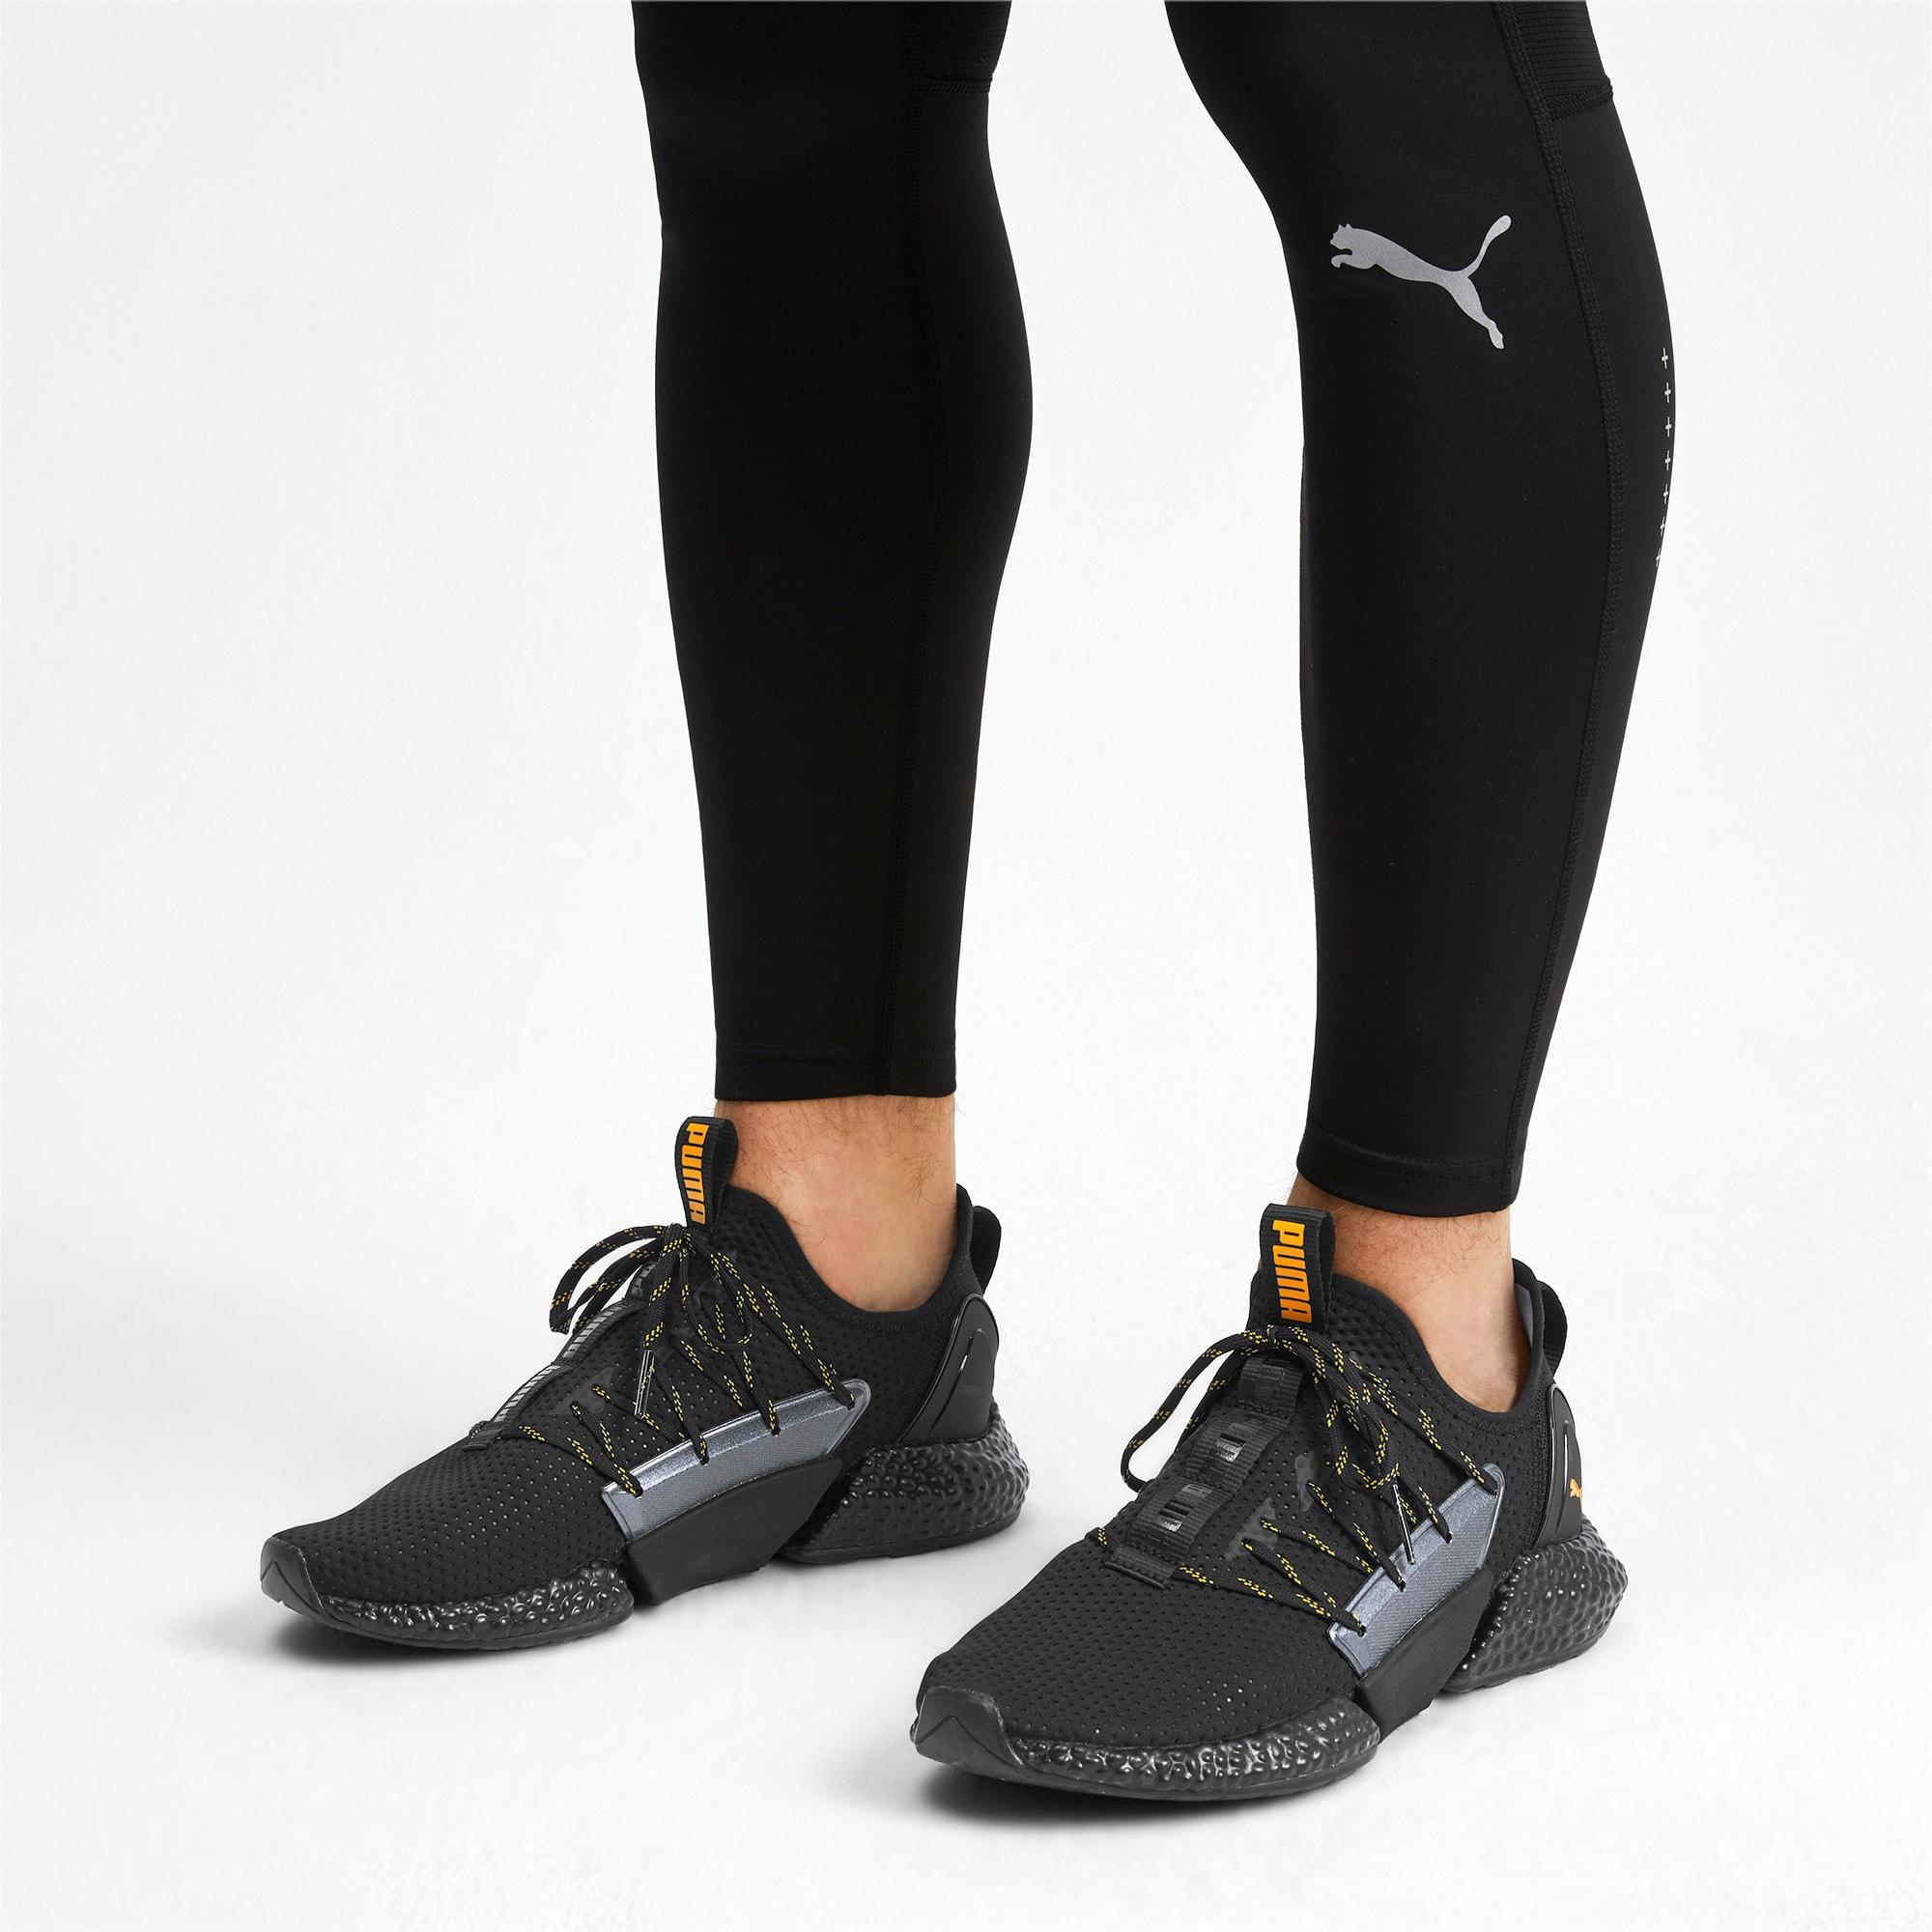 Thumbnail 2 of HYBRID Rocket Aero Men's Running Shoes, Puma Black-Puma Black, medium